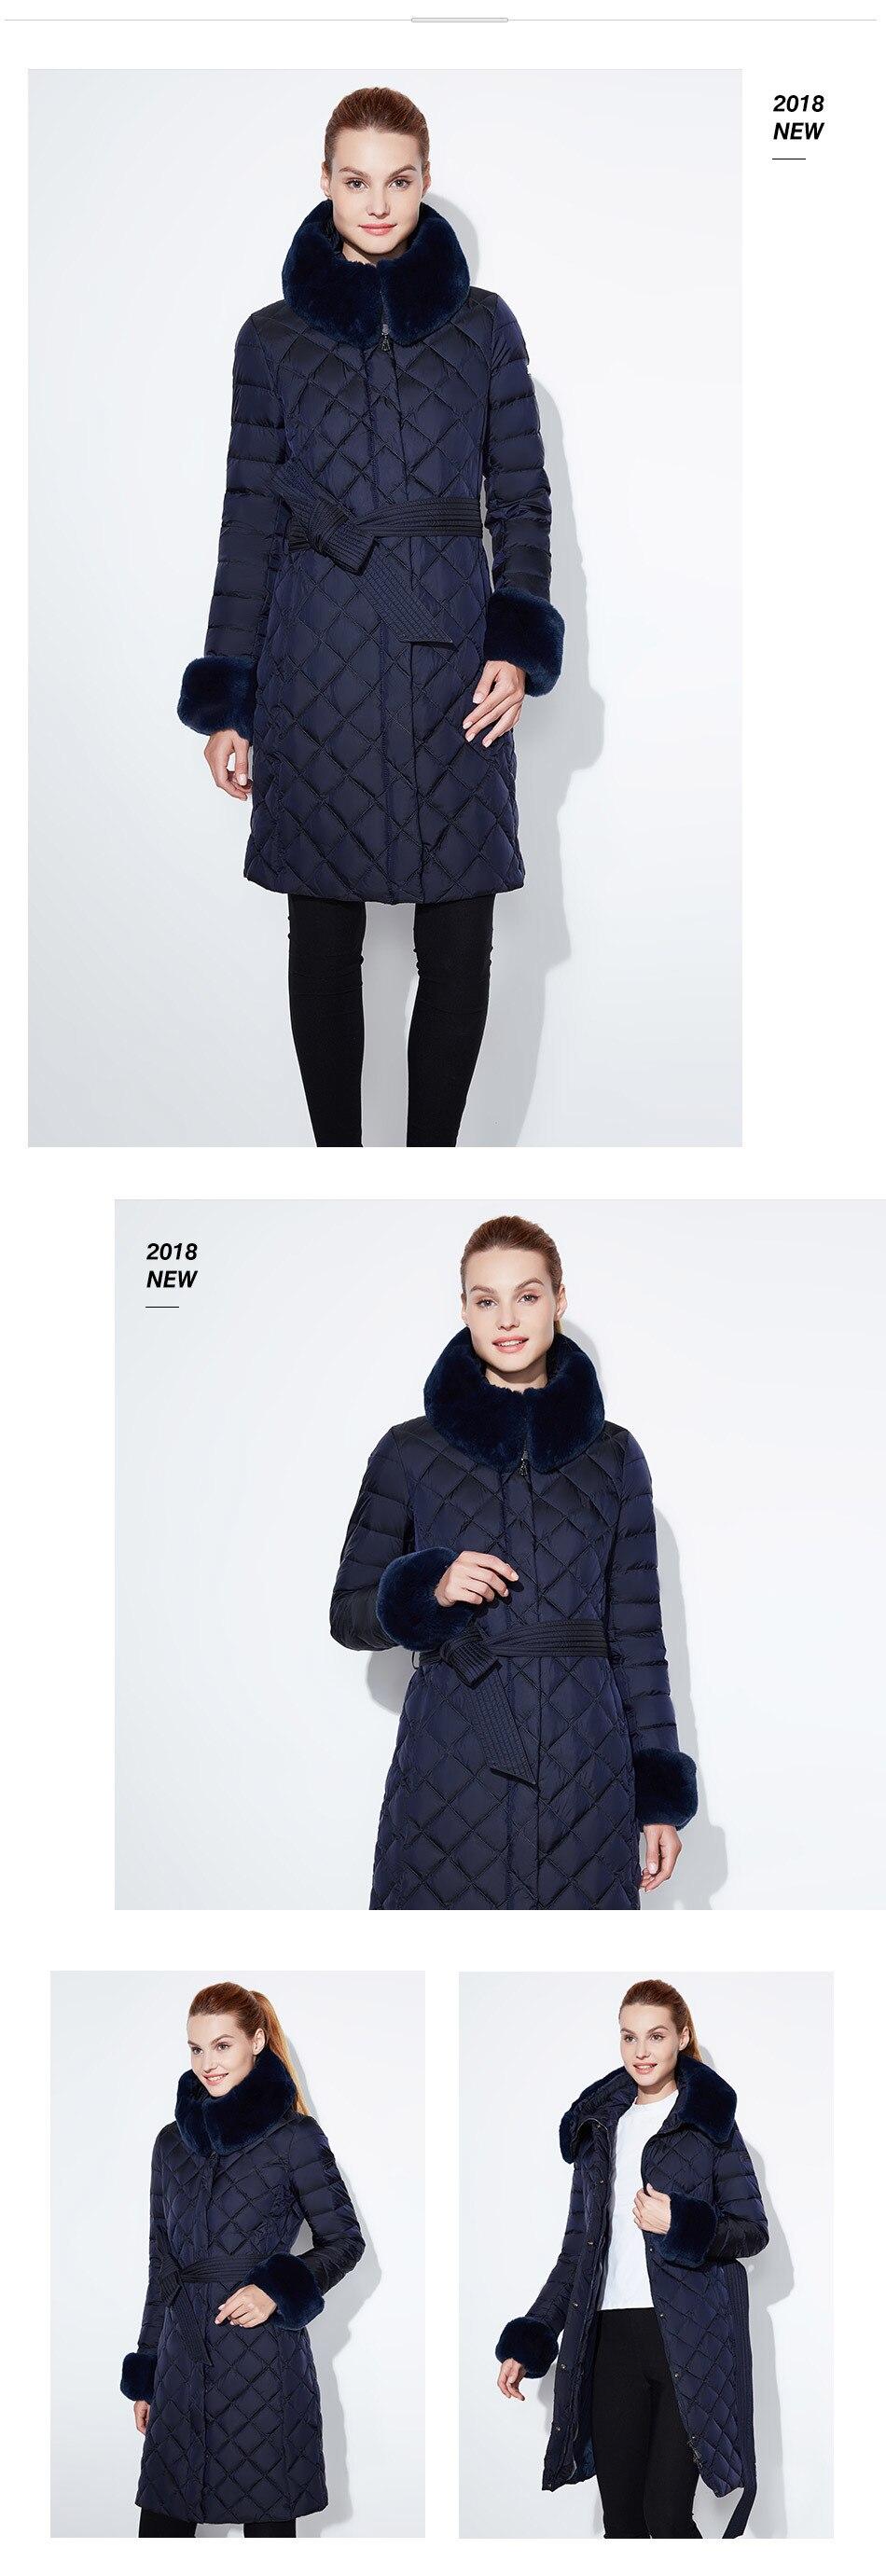 Neve clássico jaqueta feminina casaco de pele